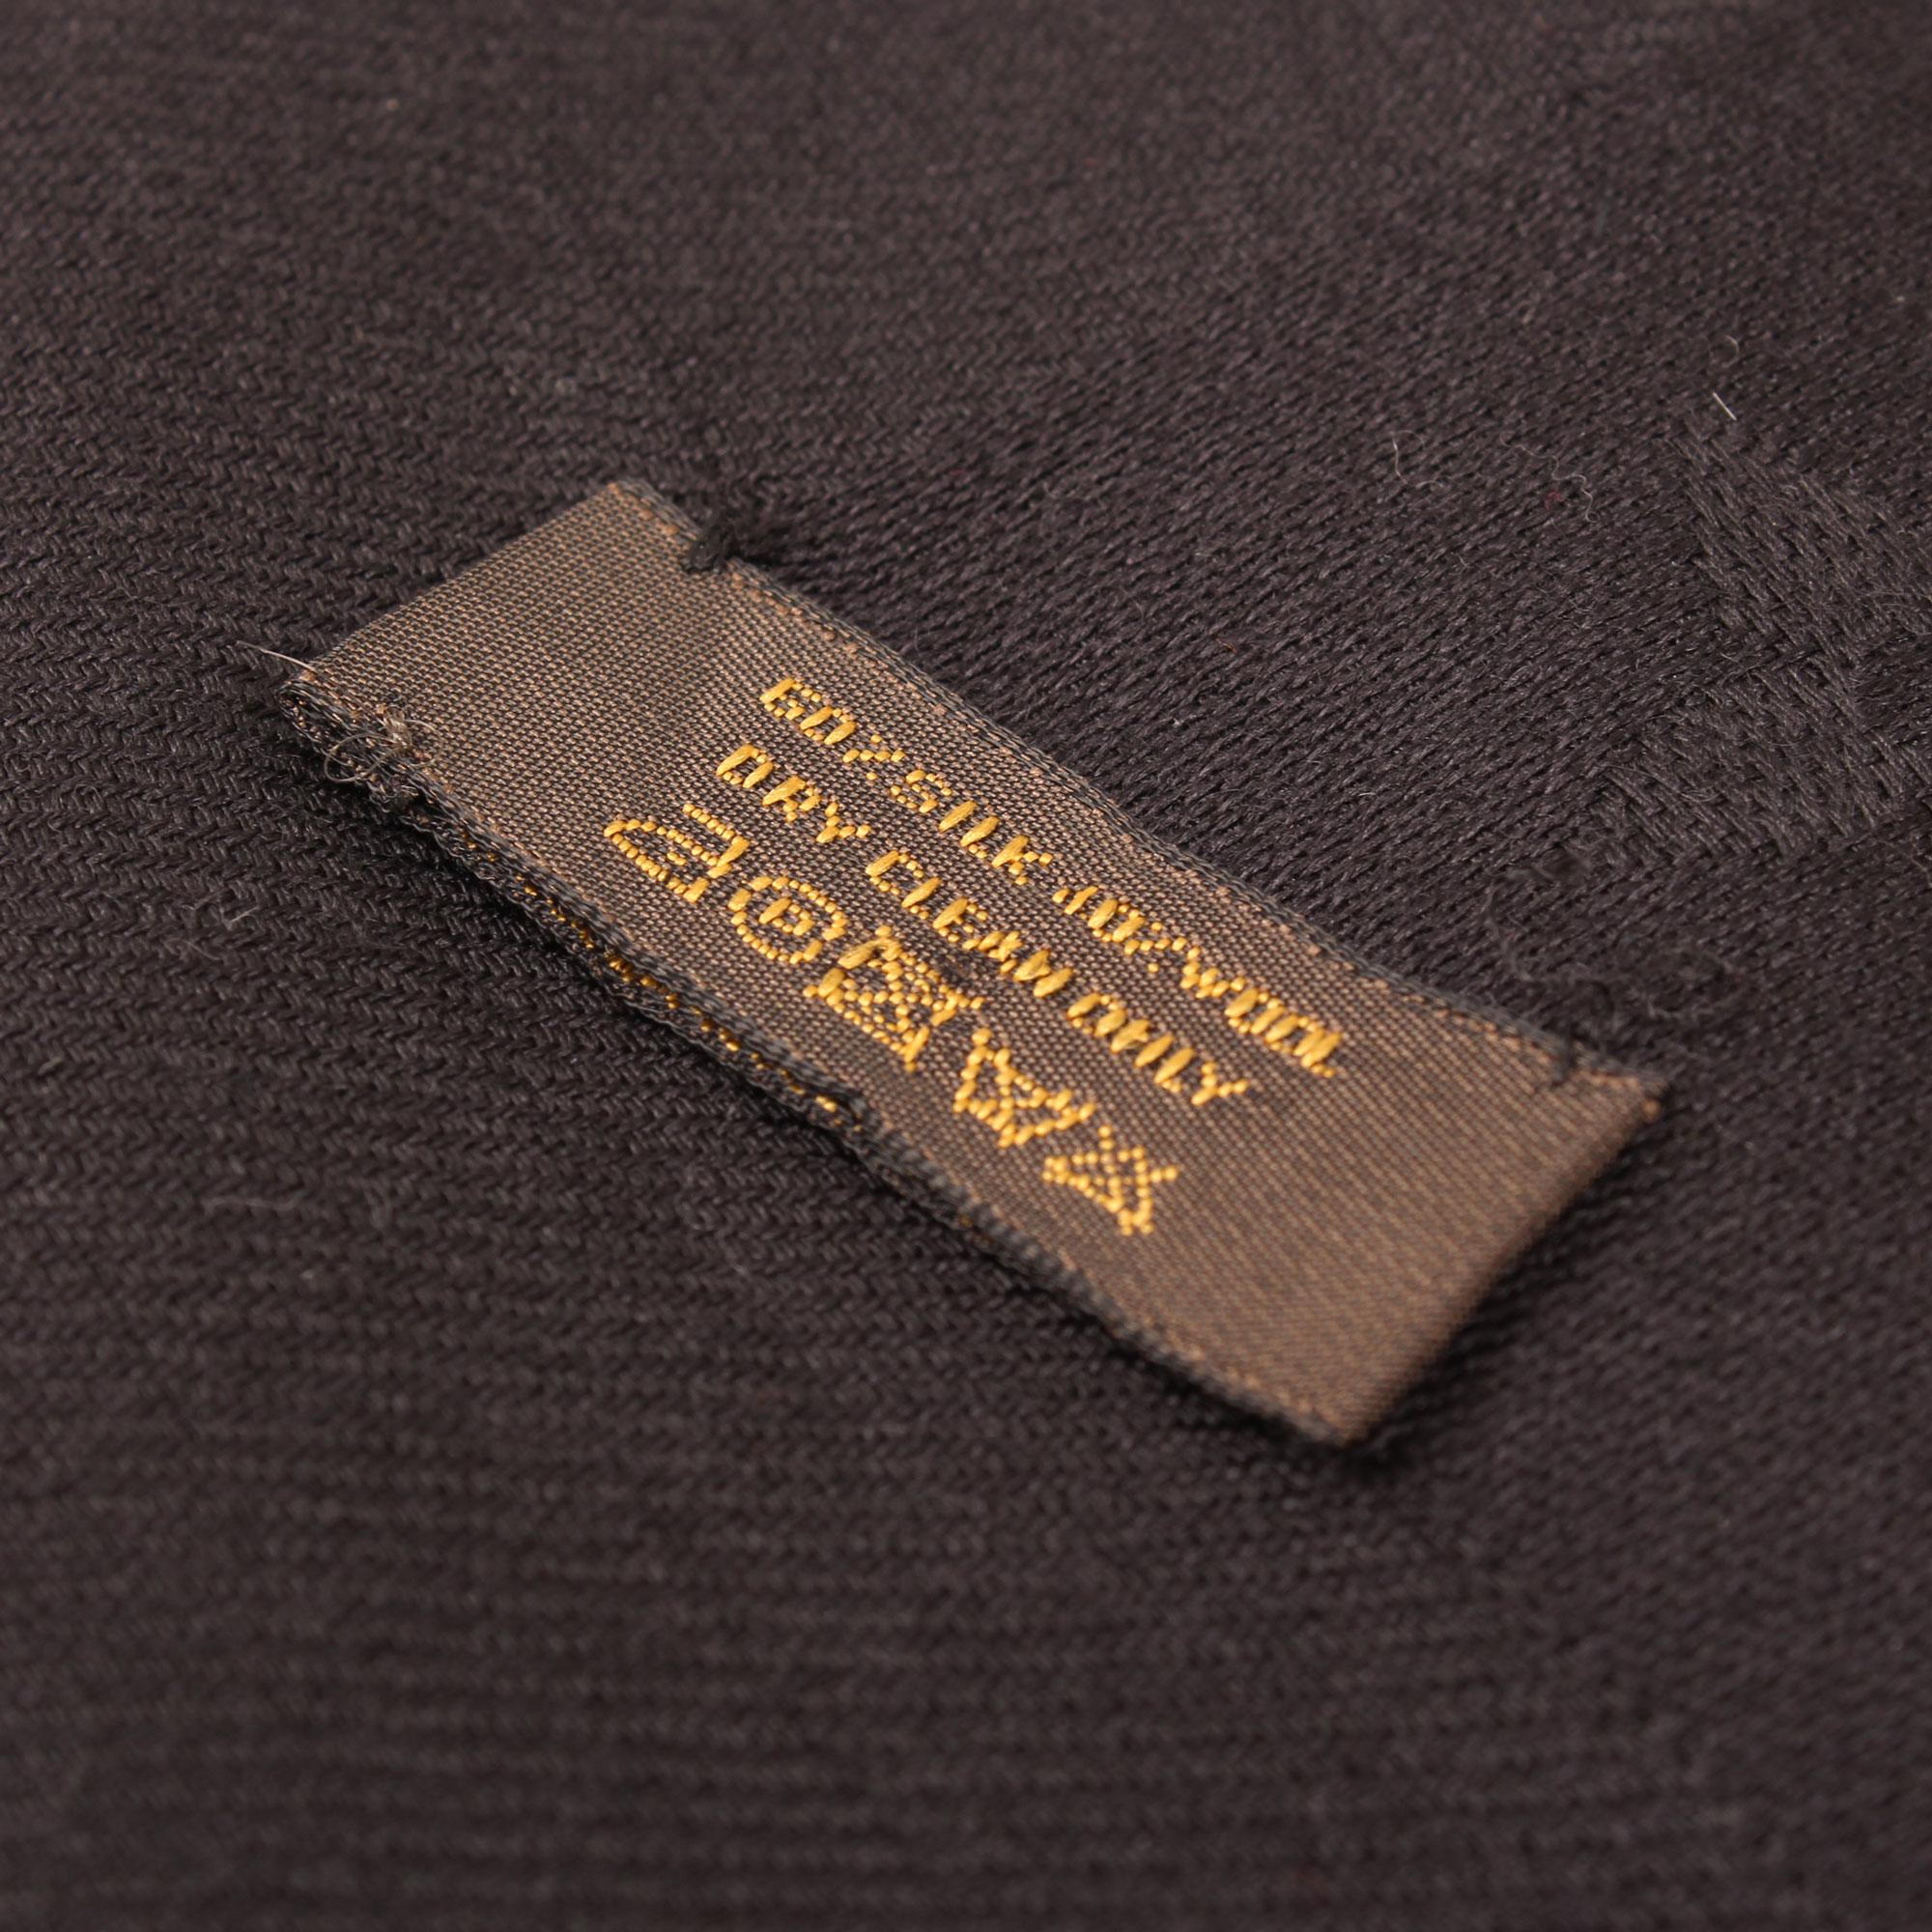 chal-louis-vuitton-monogram-negro-etiqueta